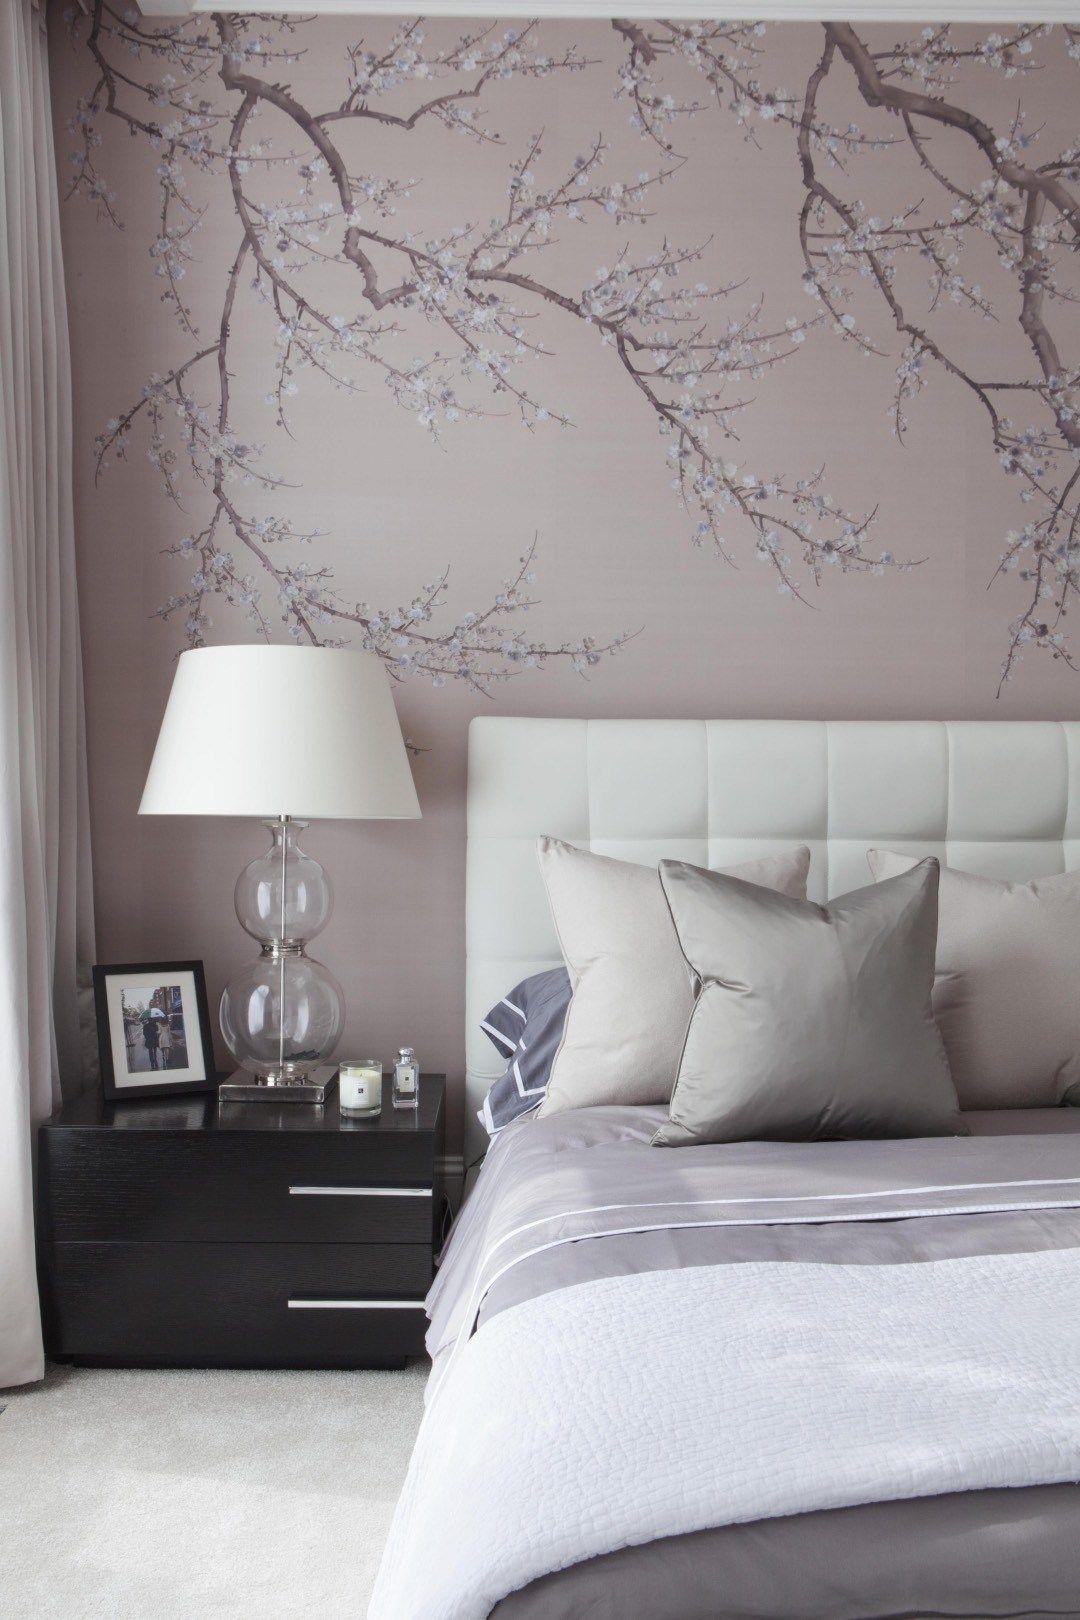 Amelia Carter Beautiful Bedroom Designs Photo Wallpaper Bedroom Interior Design